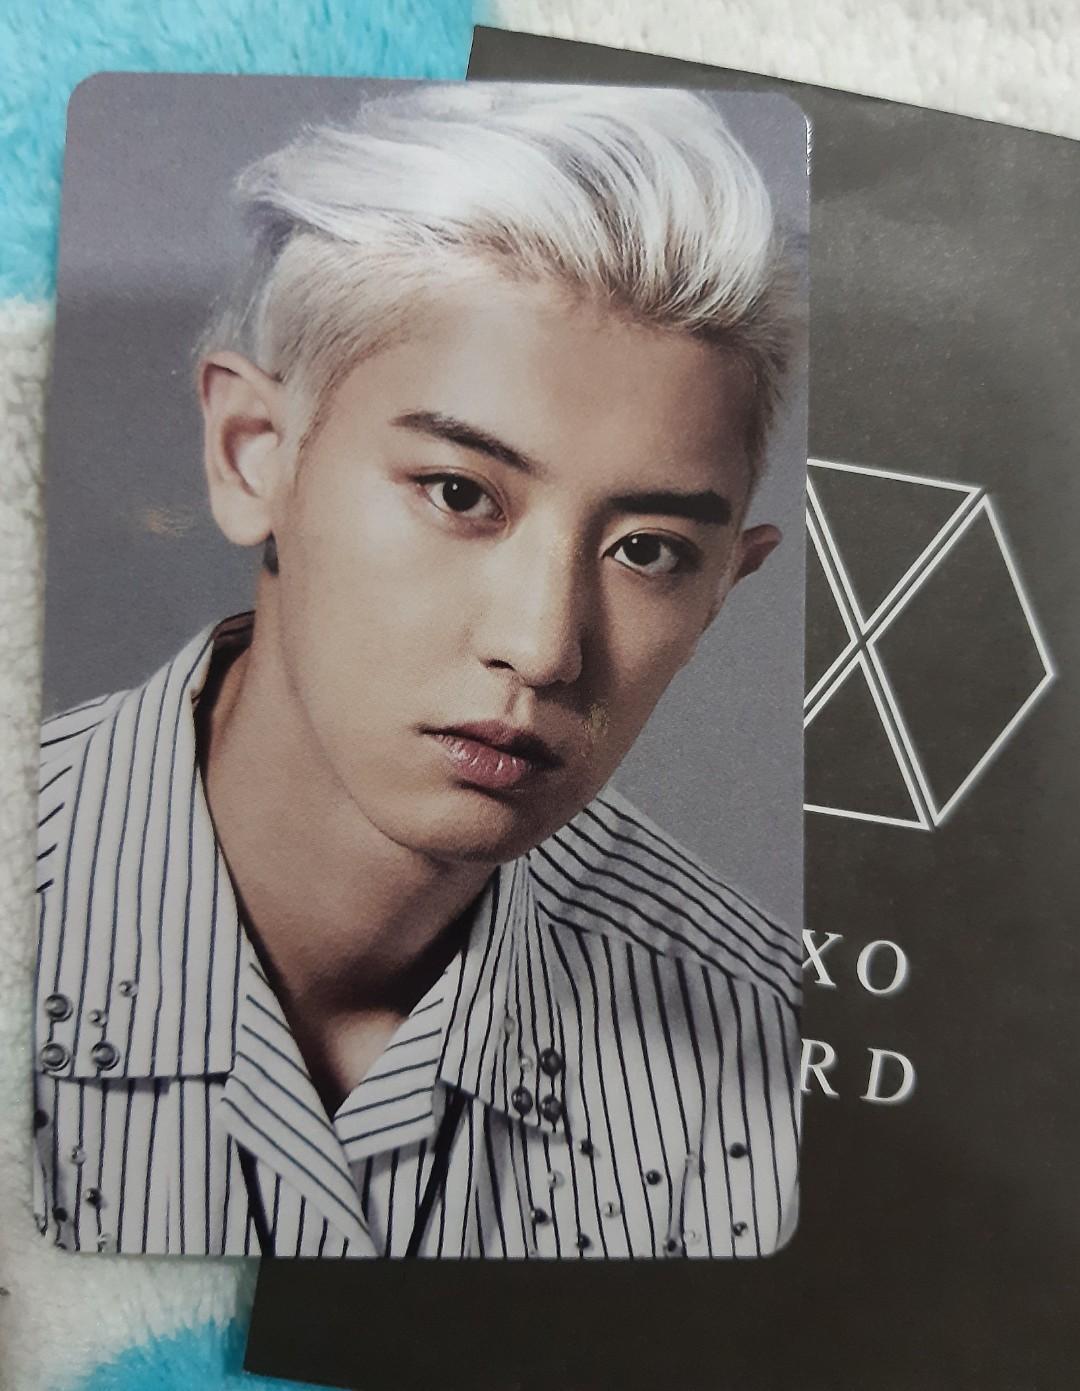 [WTT] Exo Japanese album - Bird Chanyeol Photocard